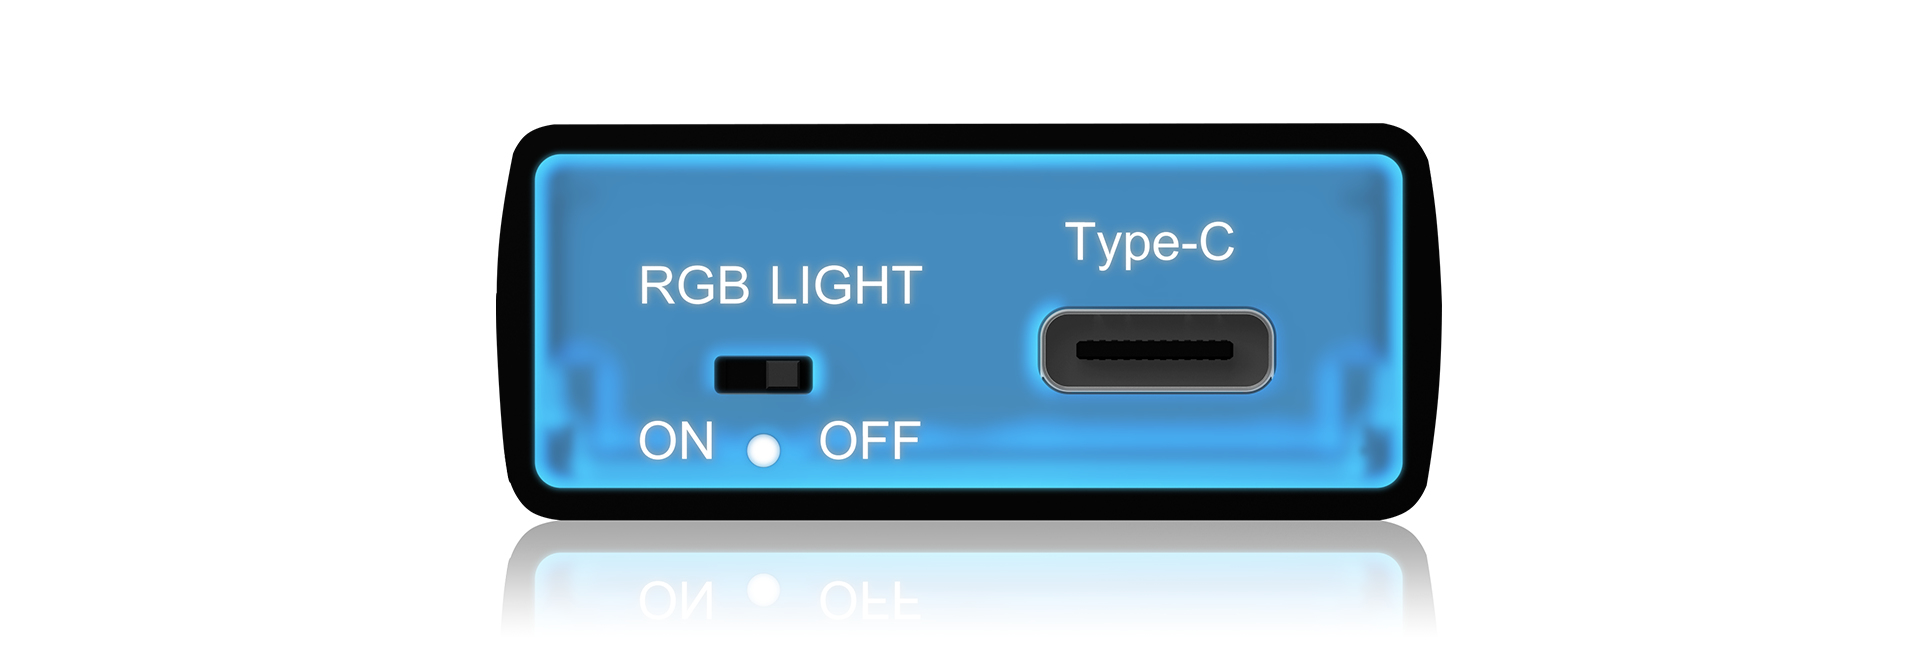 ICY BOX ICY BOX IB-G1826MF-C31 - Speichergehäuse - M.2 - M.2 NVMe Card - 10 Gbit/s - USB 3.1 (Gen 2)